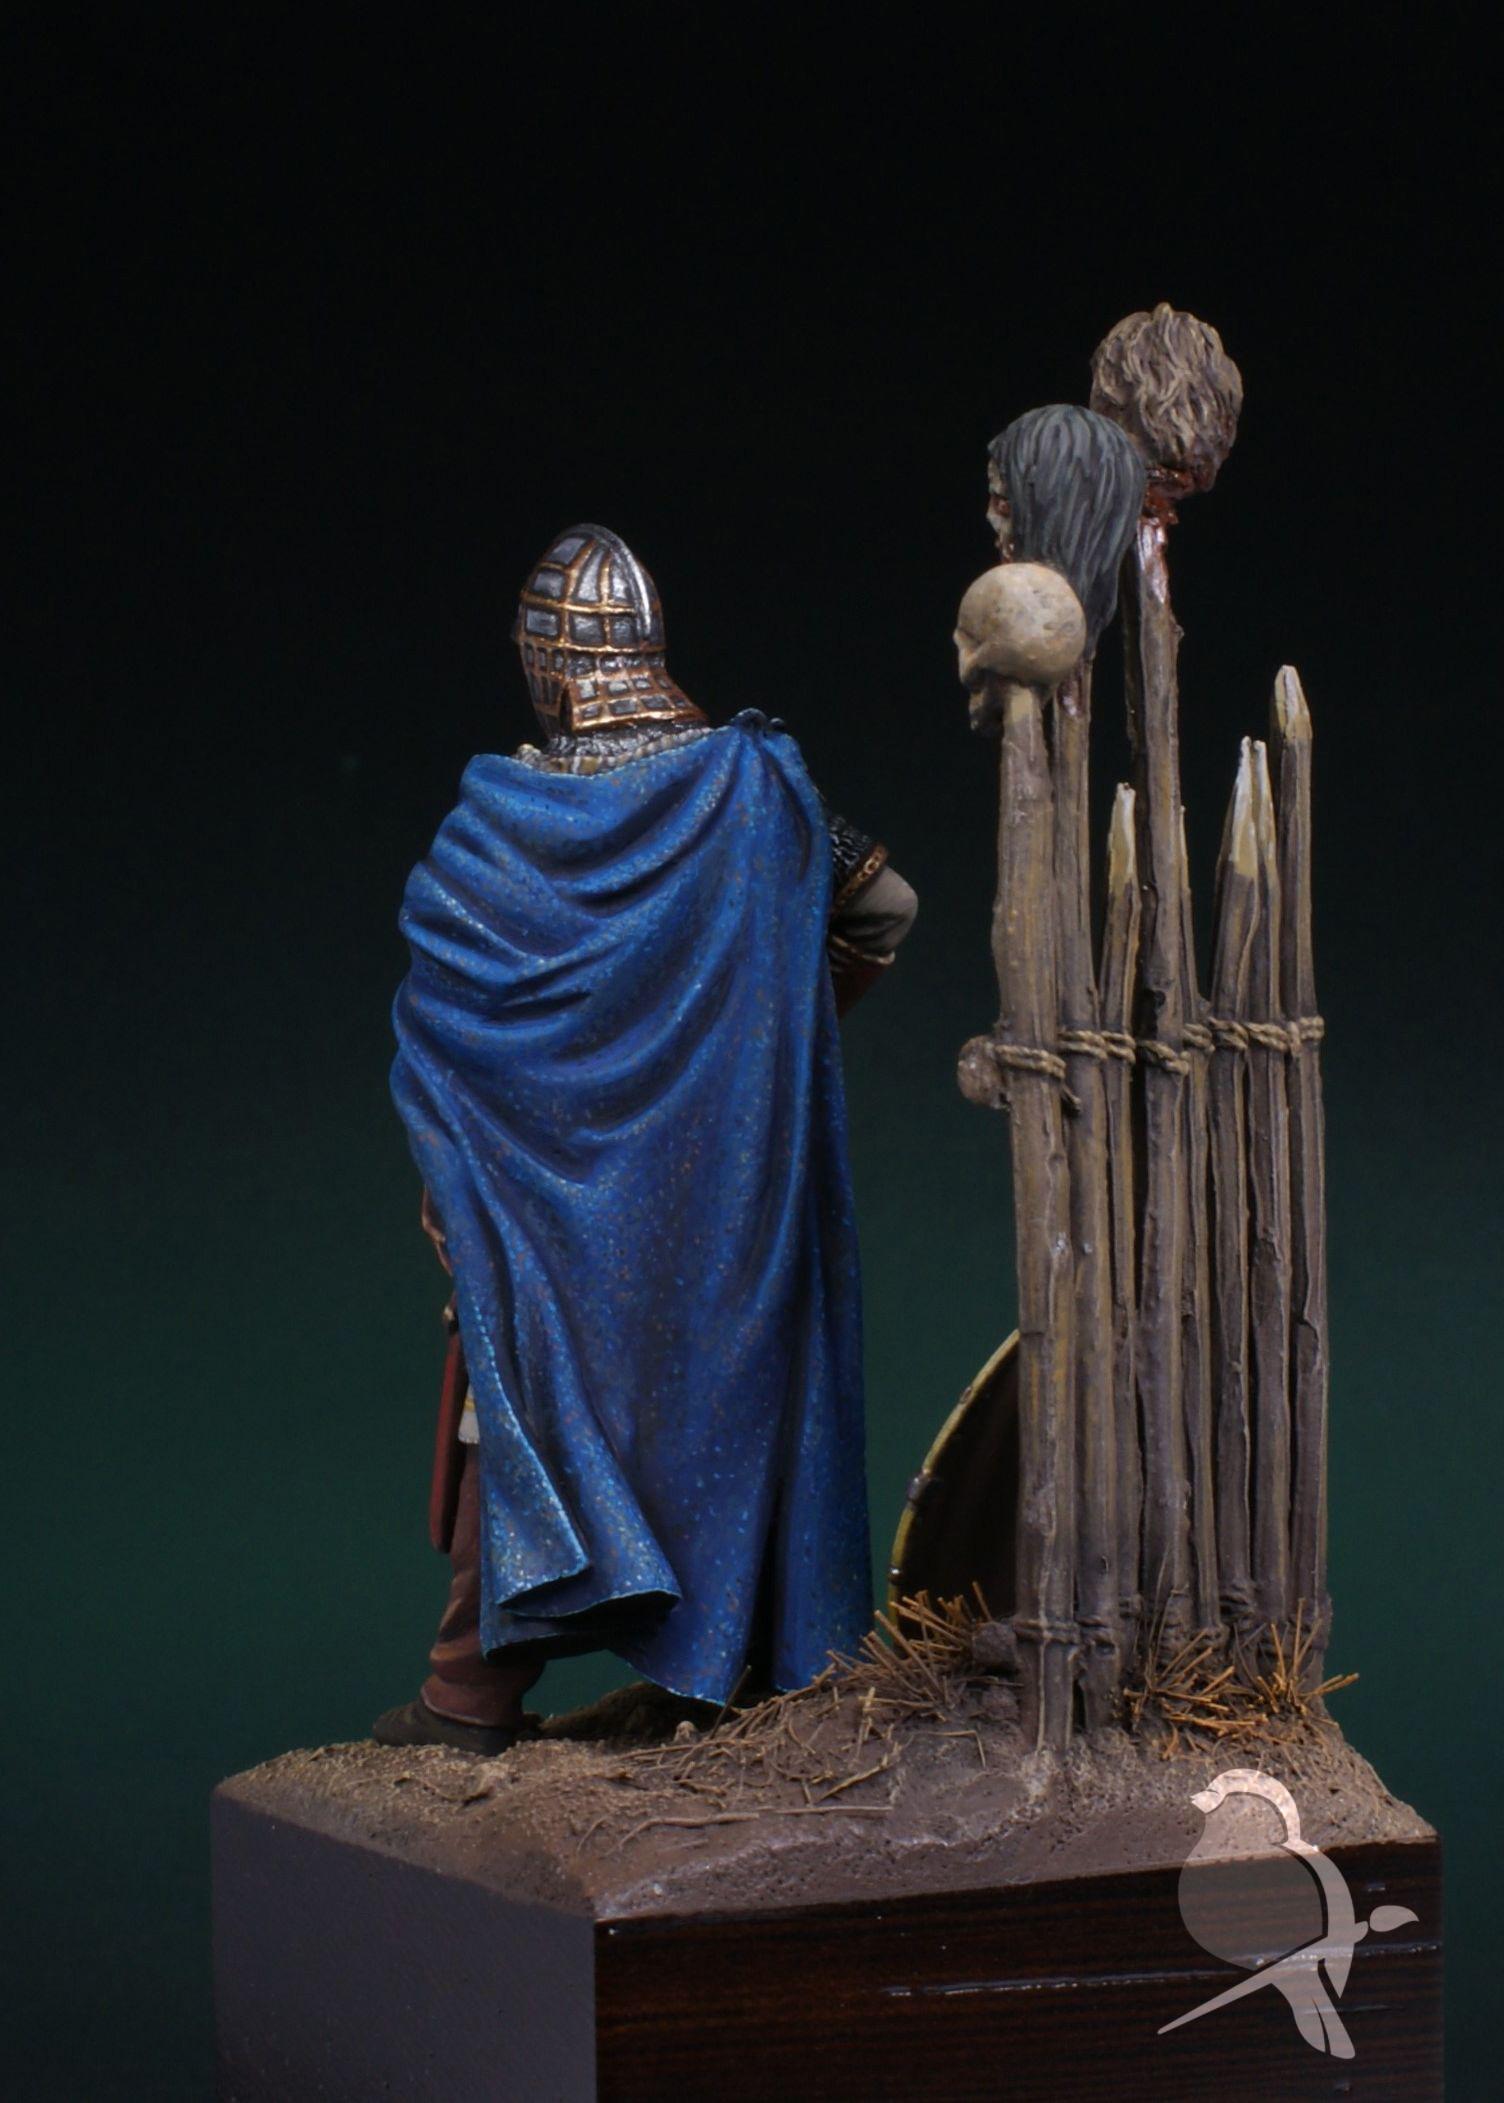 Figures: Saxon warlord, photo #4